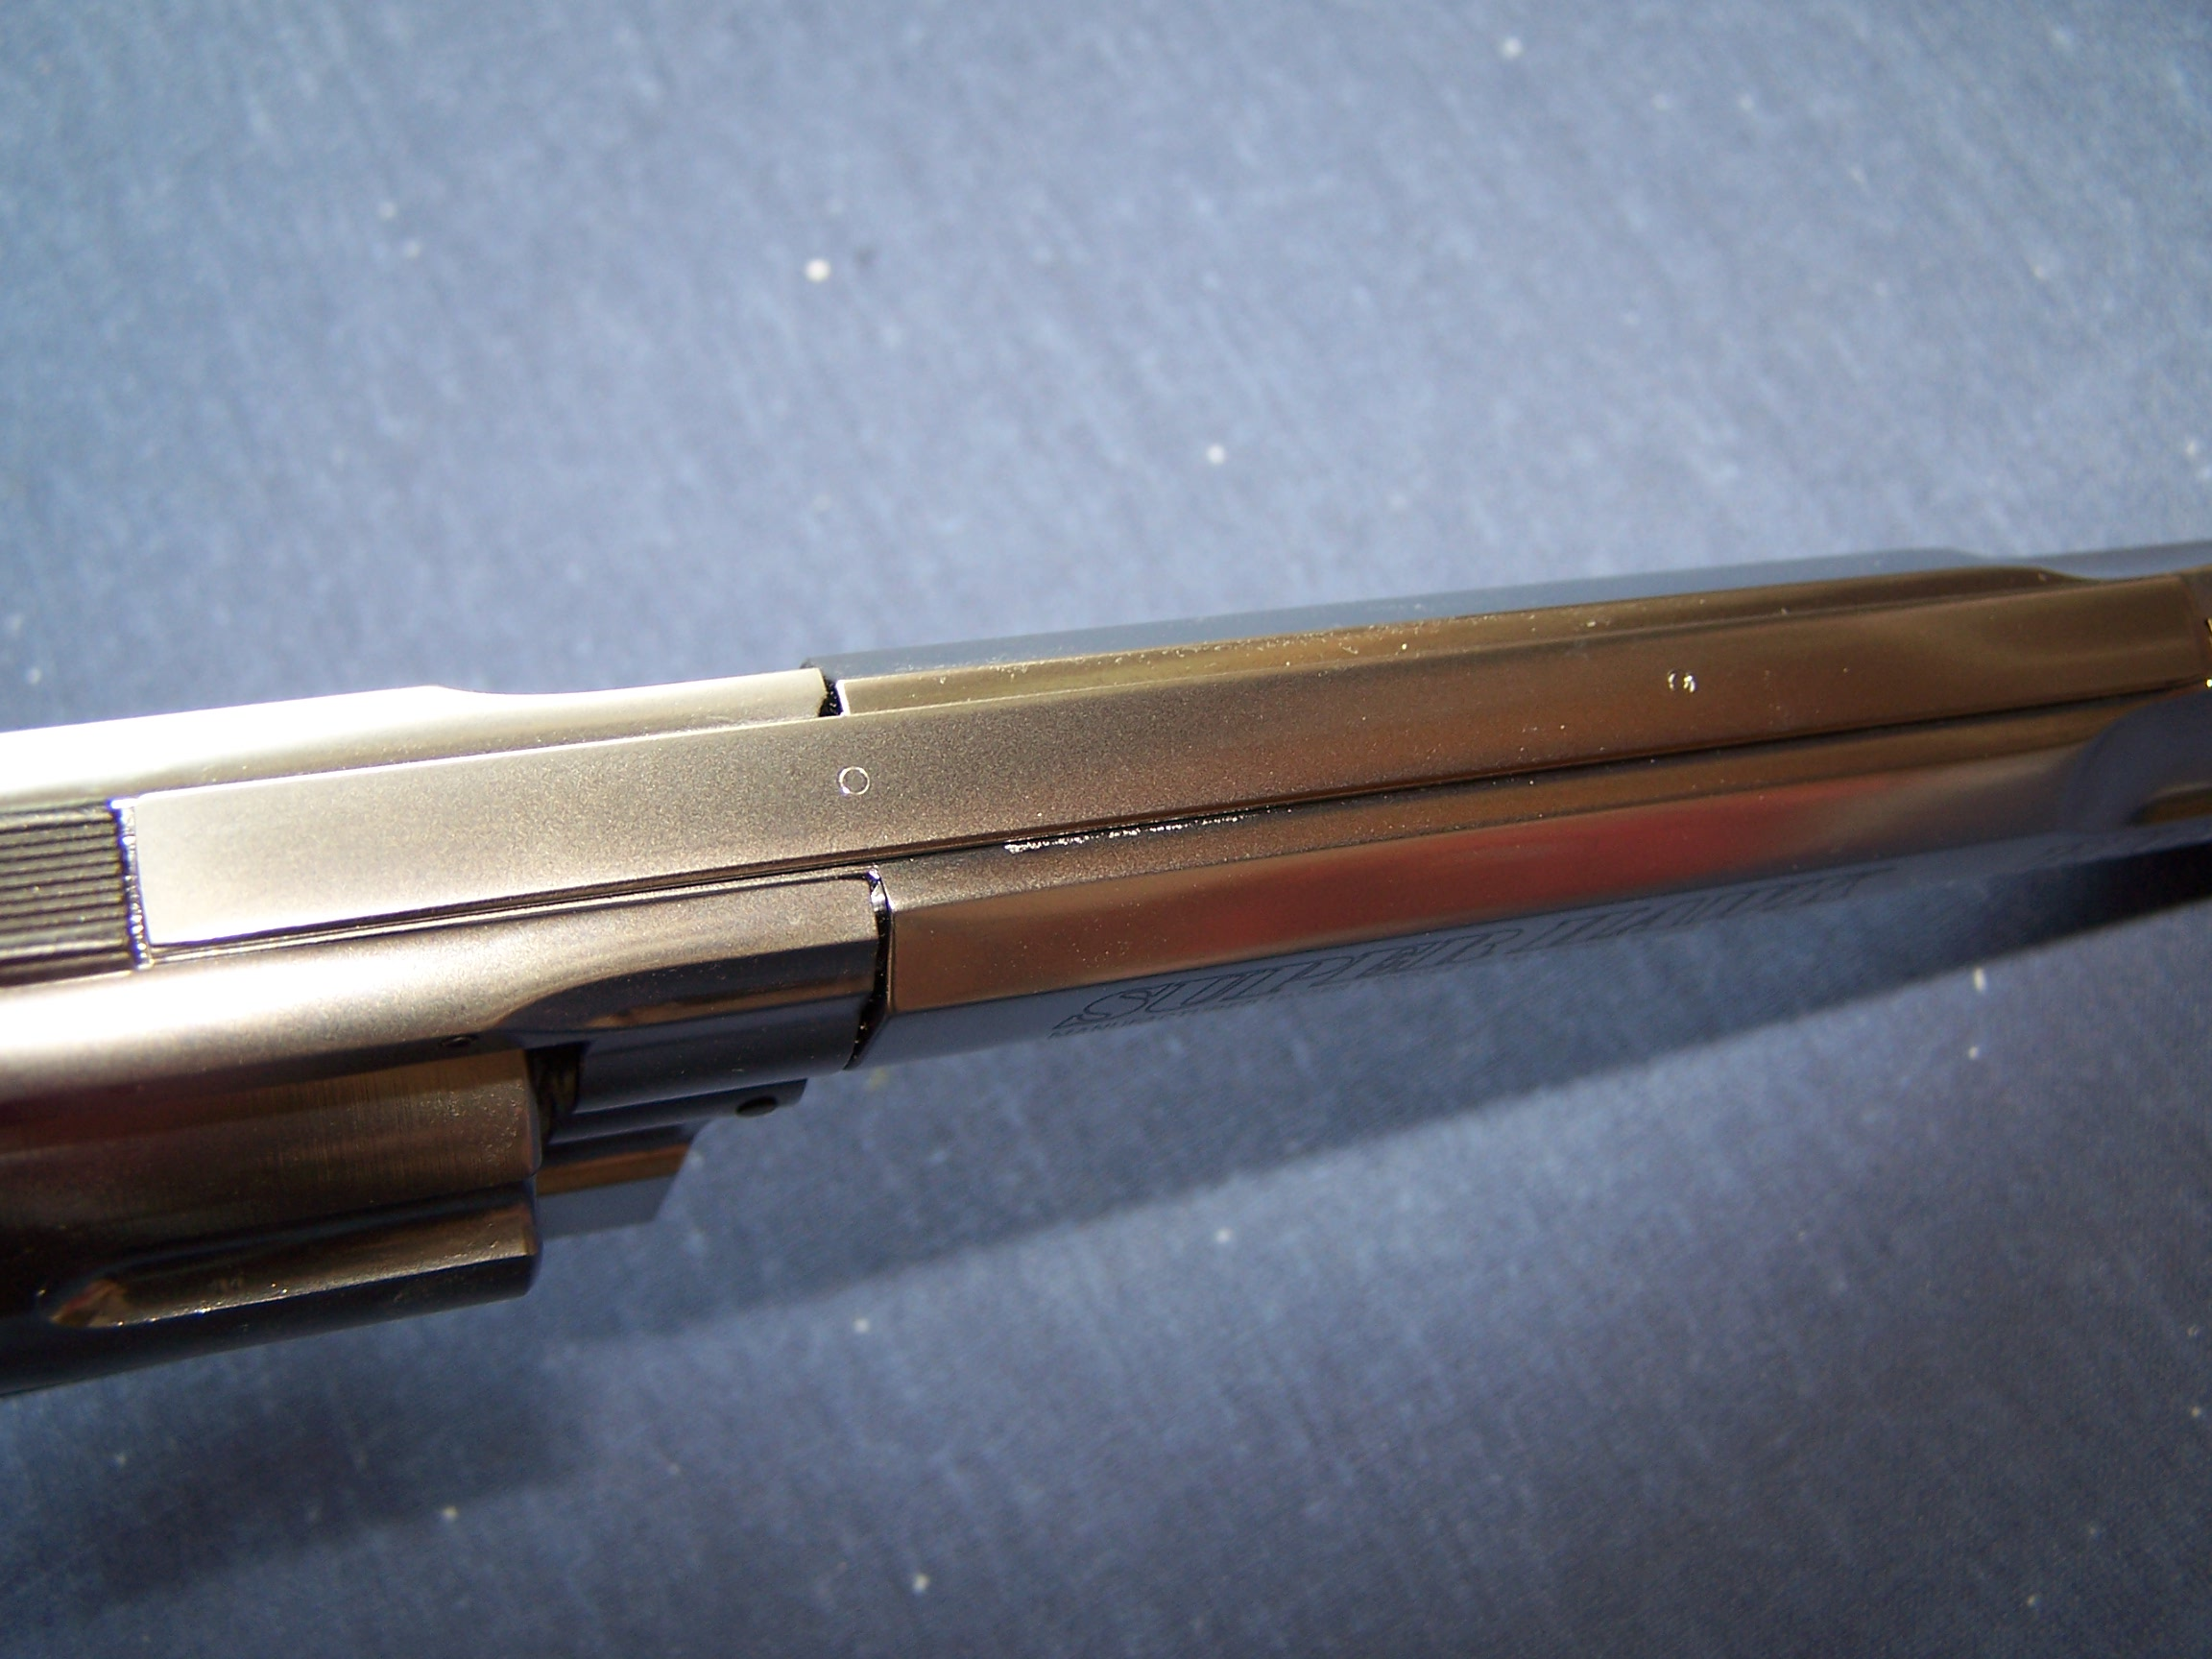 ... Airbrush Pistole, Airbrushpistol e Typ 134 mit Double-Action- Funktion